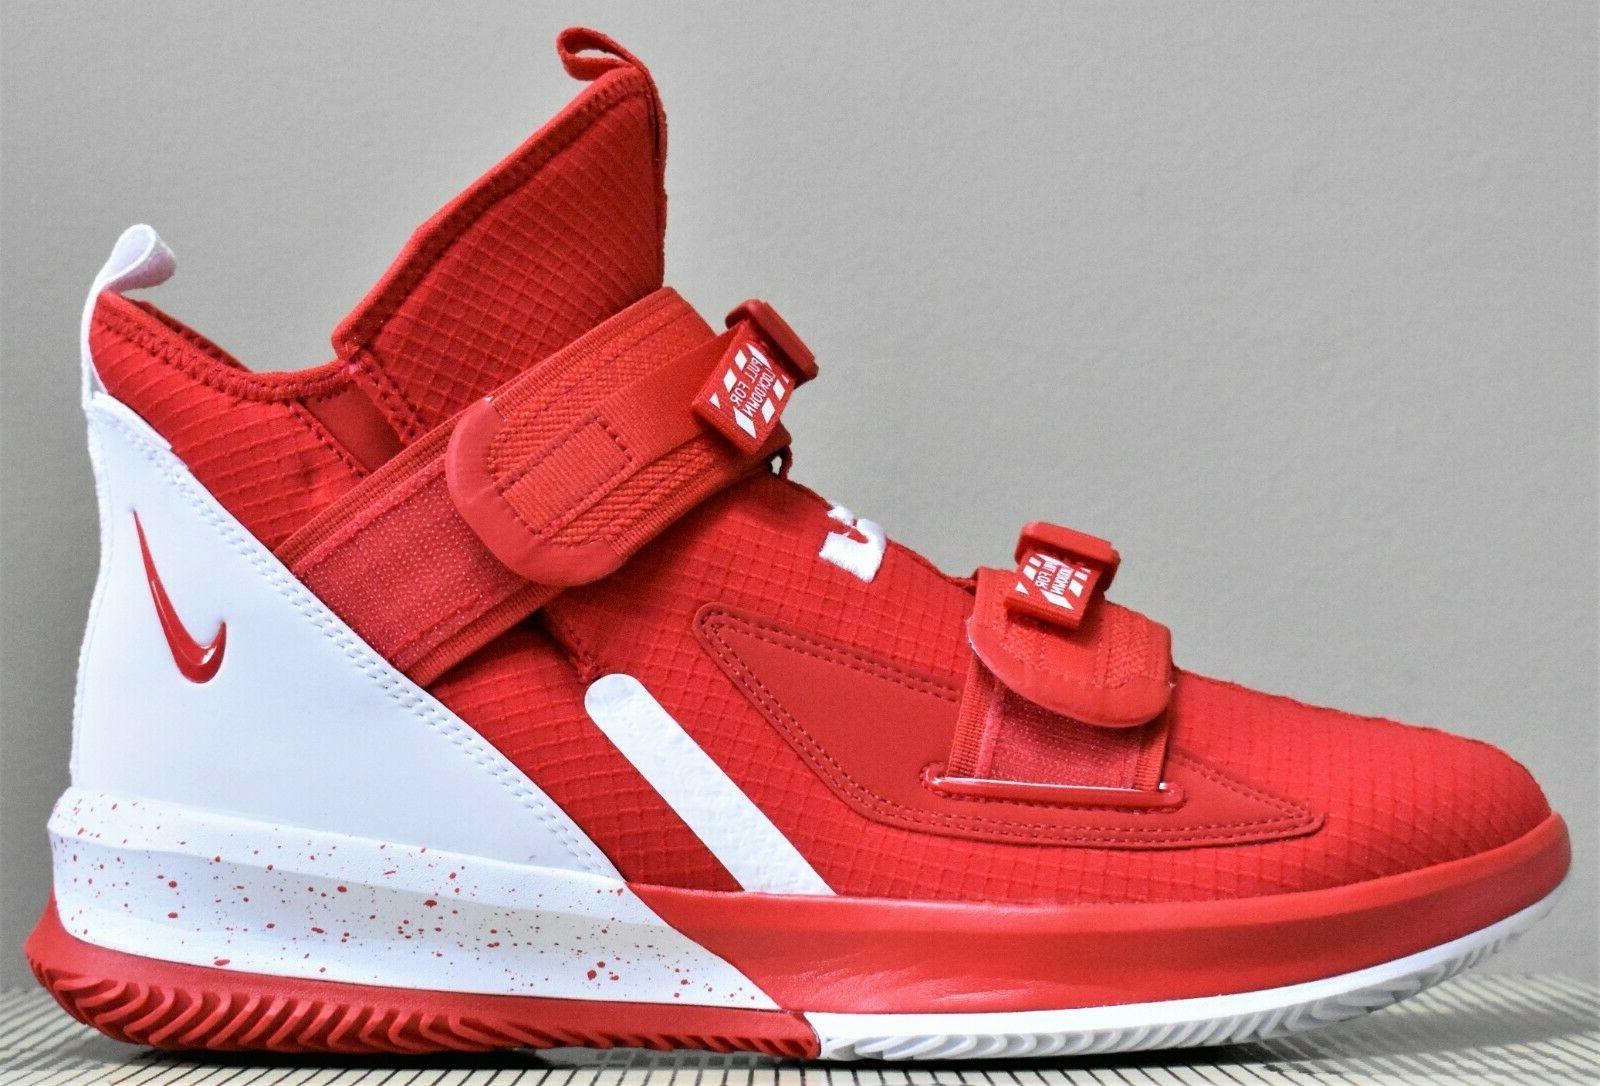 Nike Soldier 13 New Men's